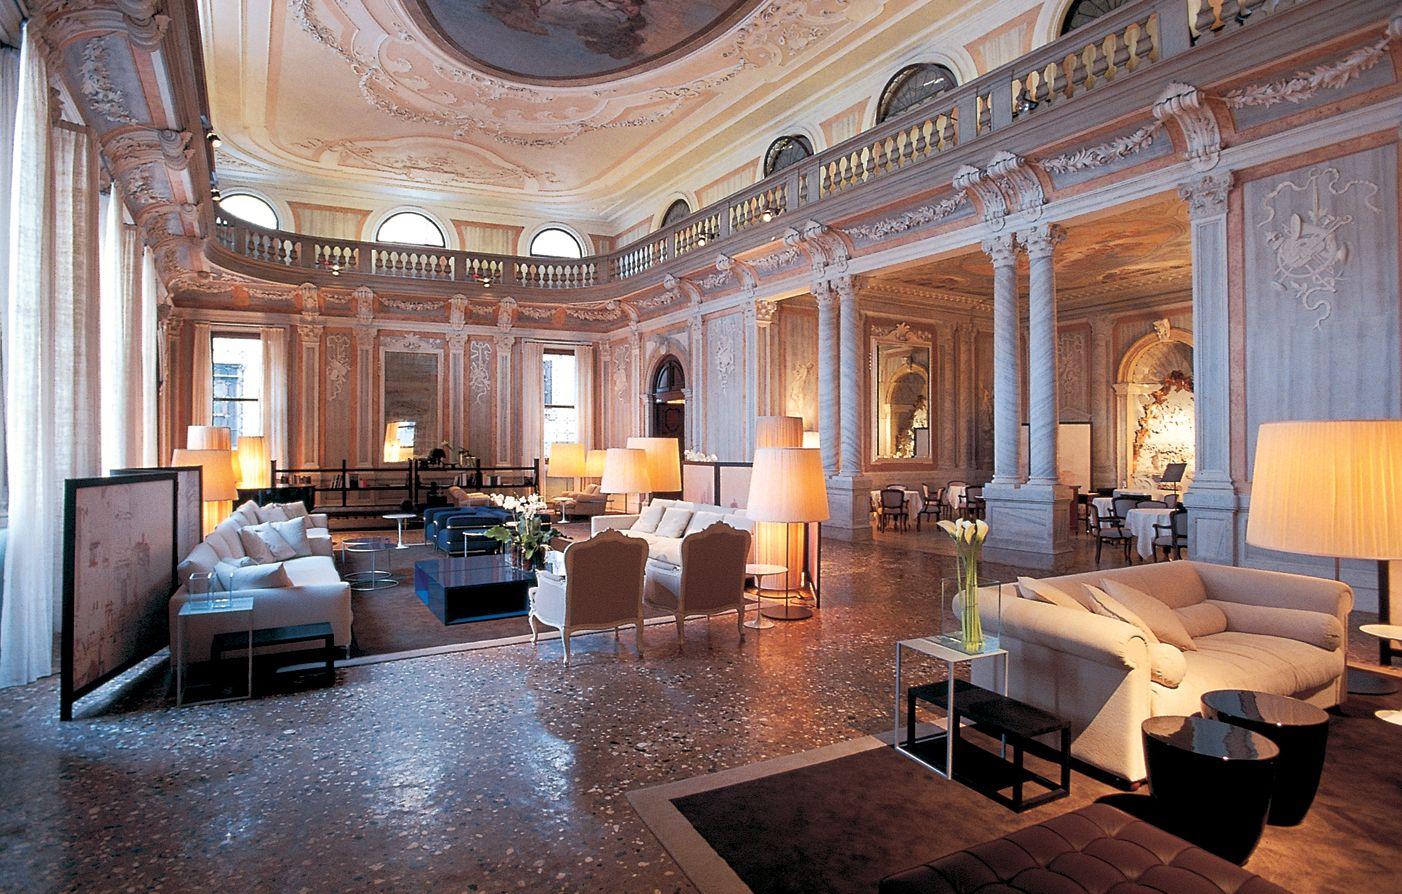 Hotel monaco grand canal venice italy hotel hotels and restaurants